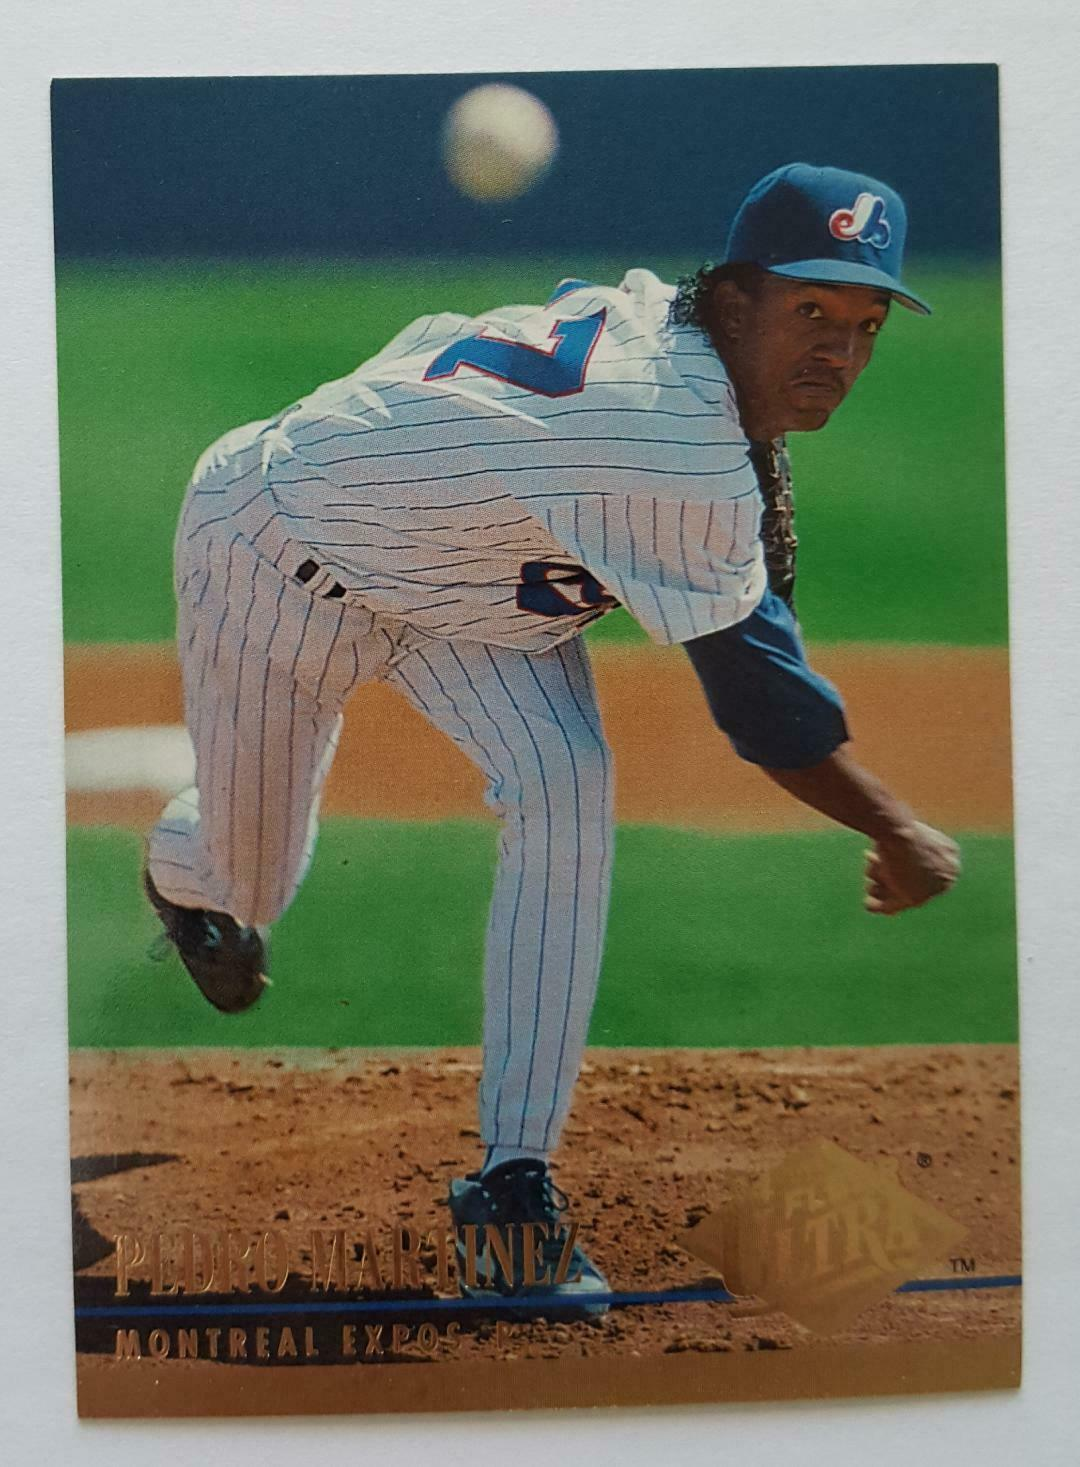 1994 Fleer Ultra + Rookie Card Lot NM Cond w/ Pat Ripp, Clint Davis, Nice Cards image 2